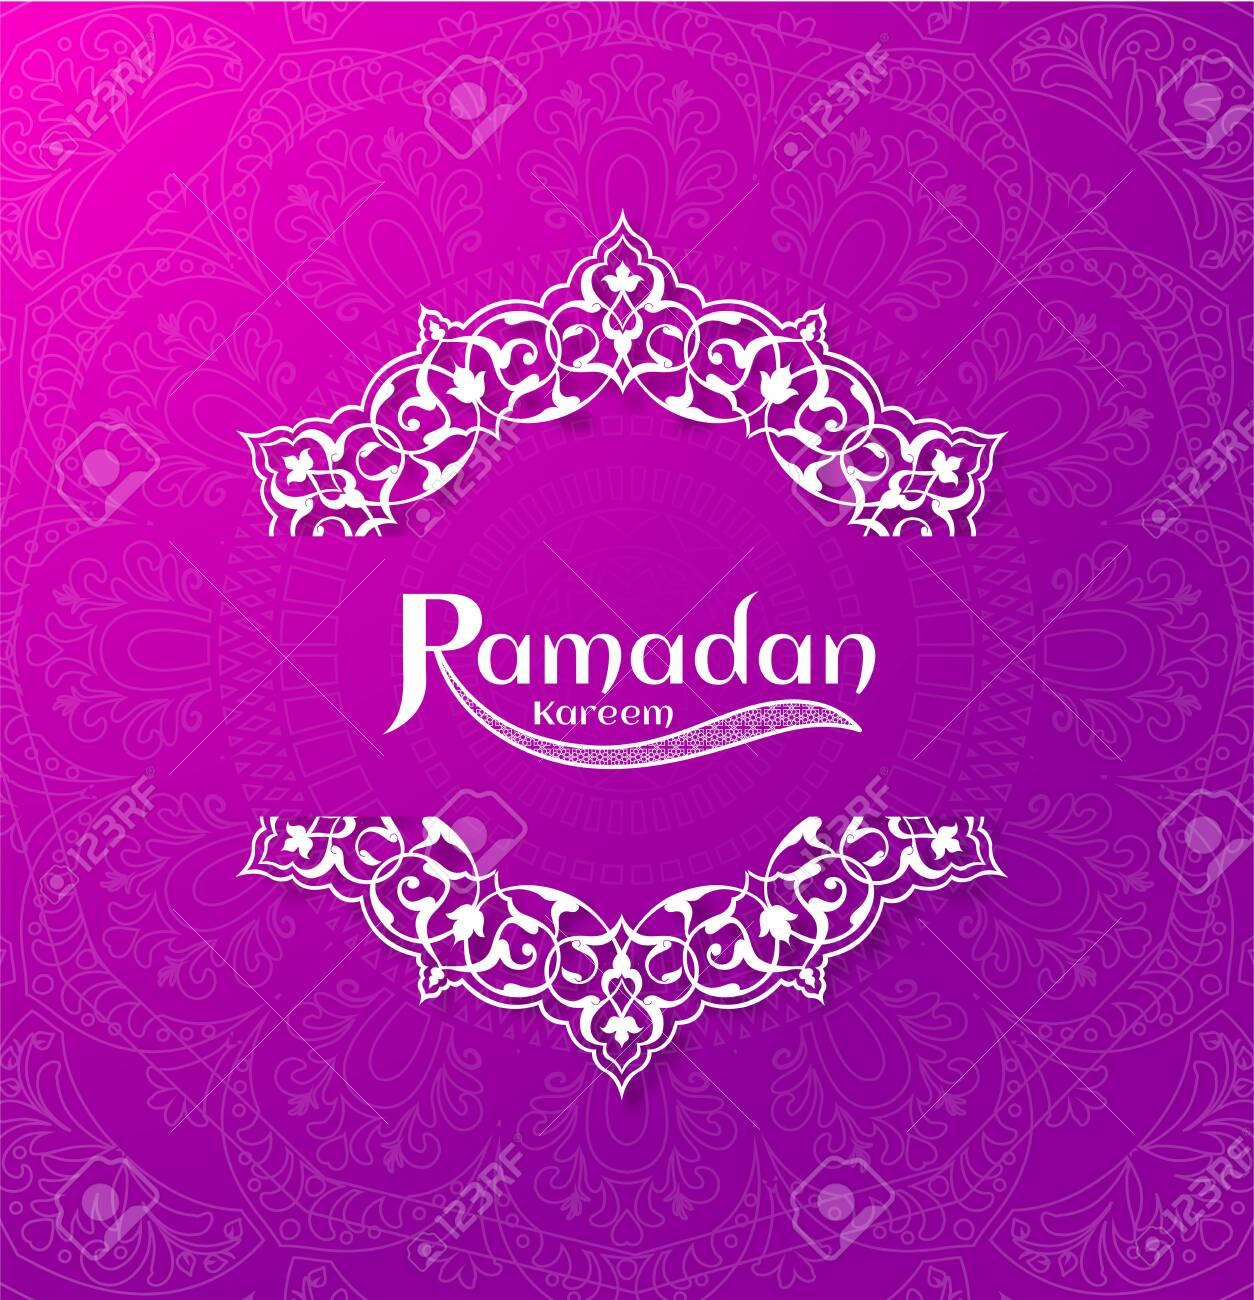 Ramadan Kareem arabic calligraphy greeting card. design islamic with Gold moon Translation of text 'Ramadan Kareem ' islamic celebration ramadan calligraphy islamic calligraphy - 145568894